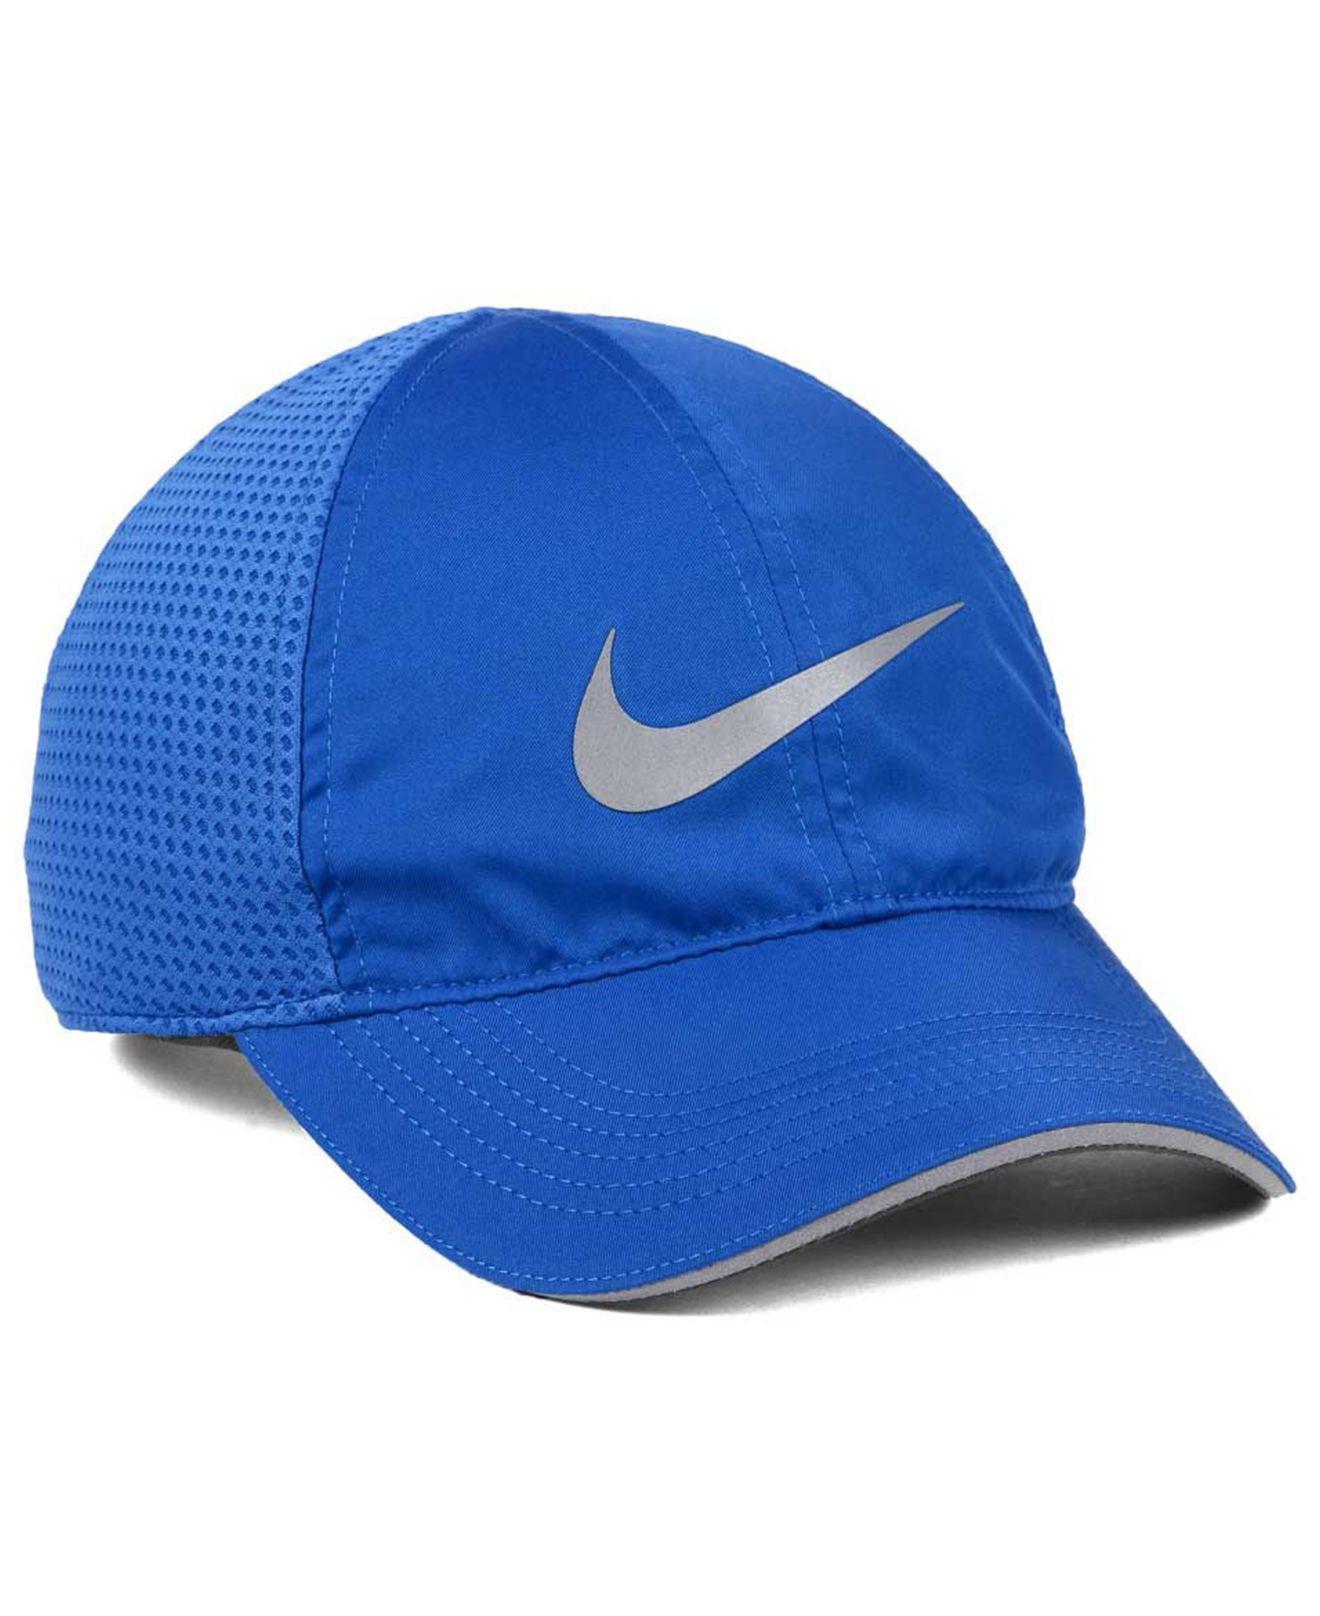 Lyst - Nike Heritage Elite Run Cap in Blue for Men dc3ada30d1e